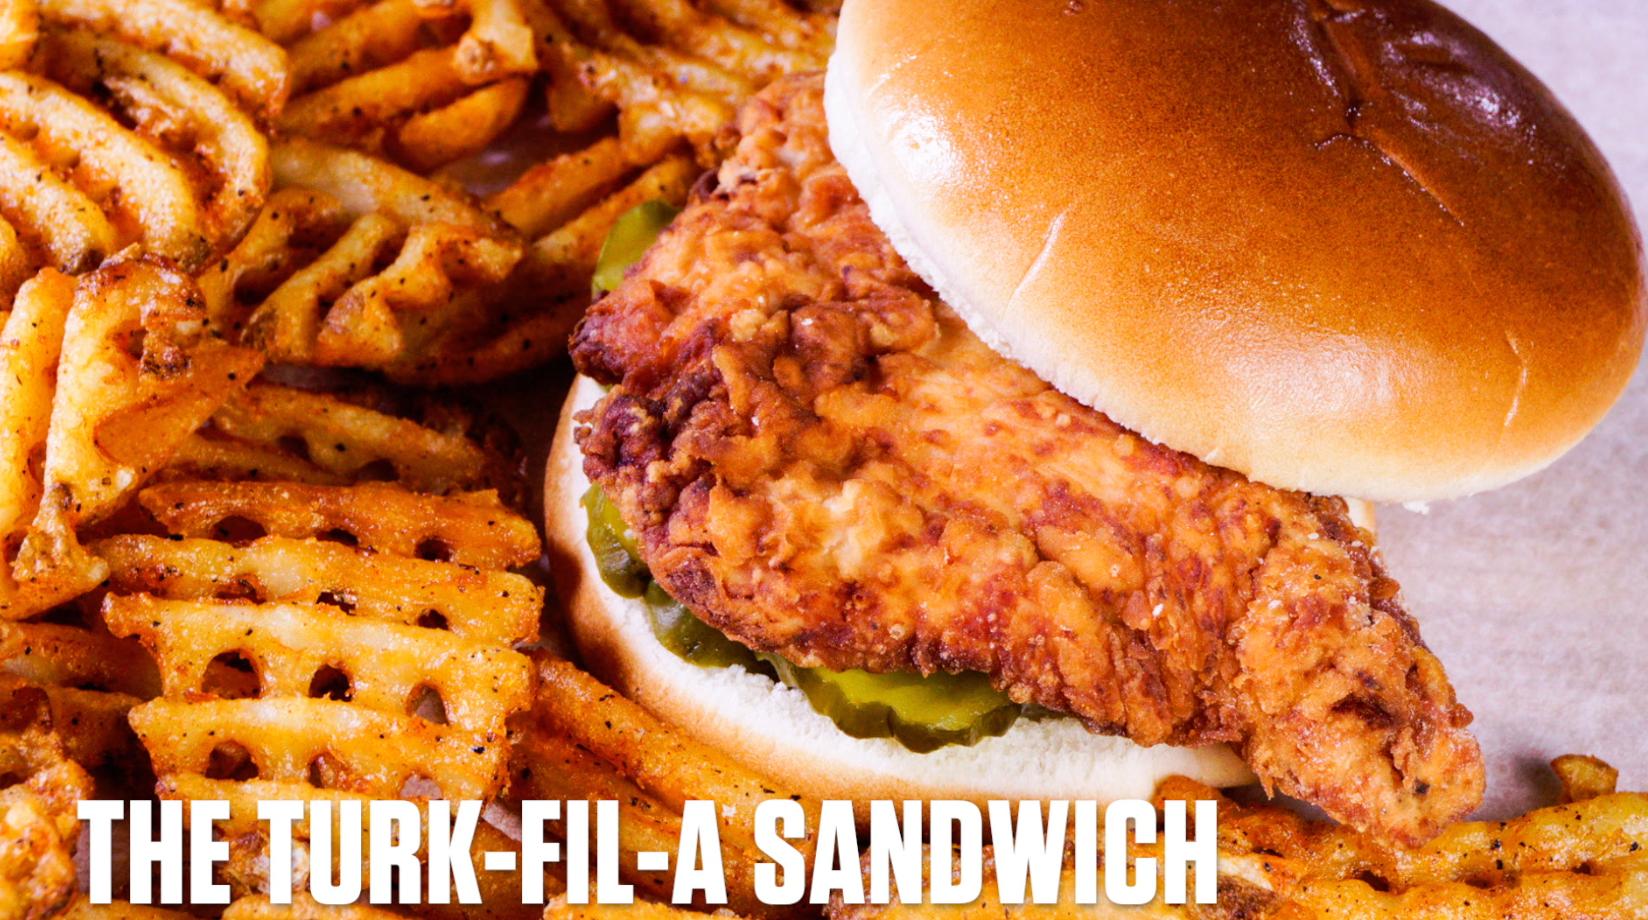 Video: How to Make a Turk-Fil-A Sandwich